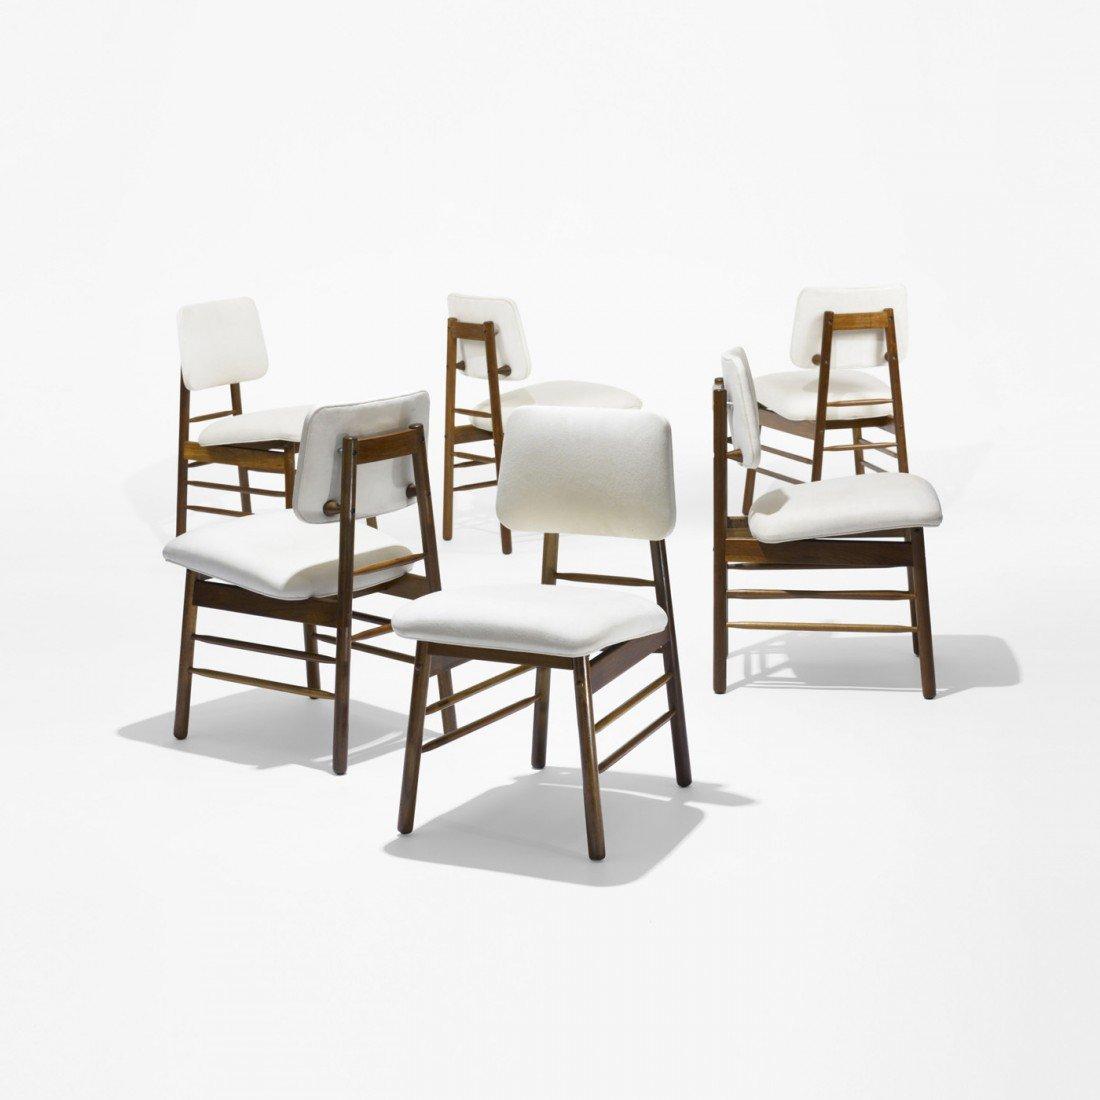 103: Grossman dining chairs, set of six